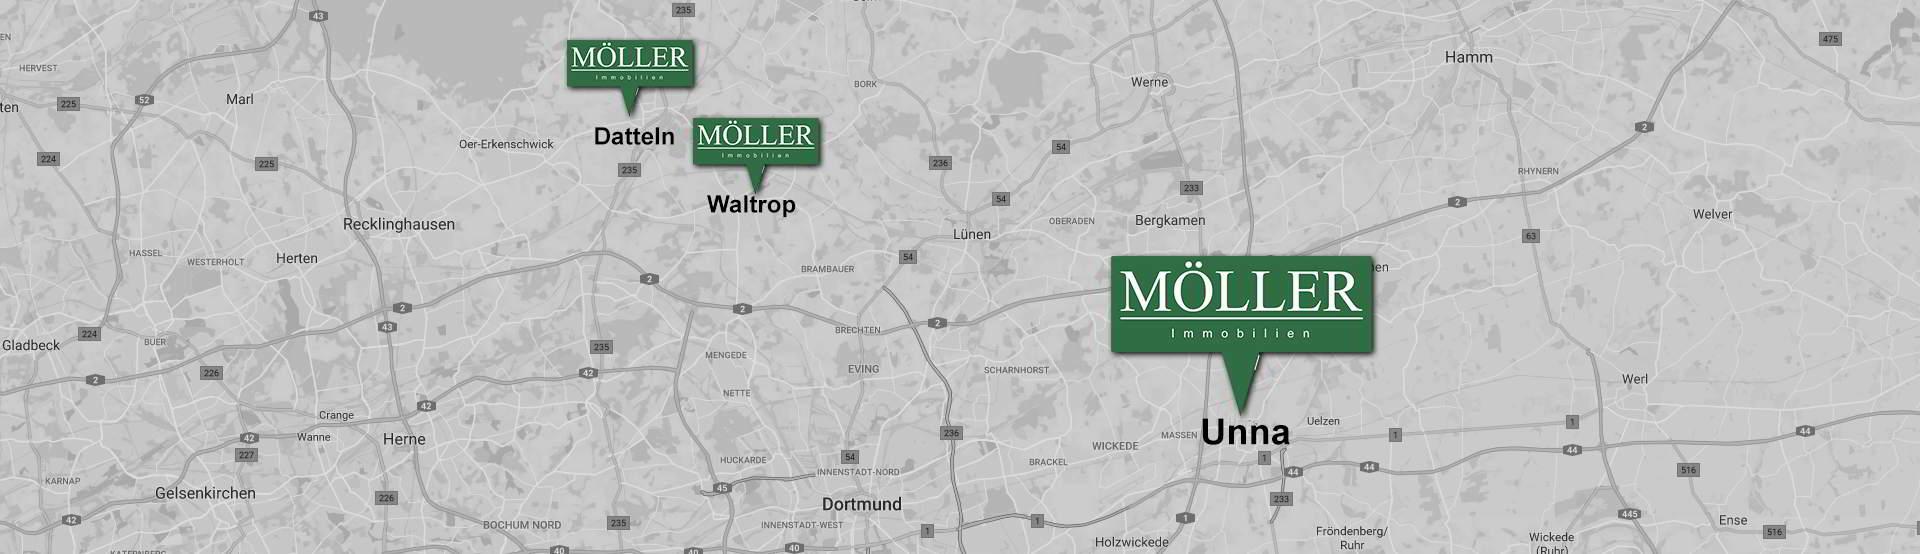 Immobilien Moeller in Unna, Datteln und Waltrop